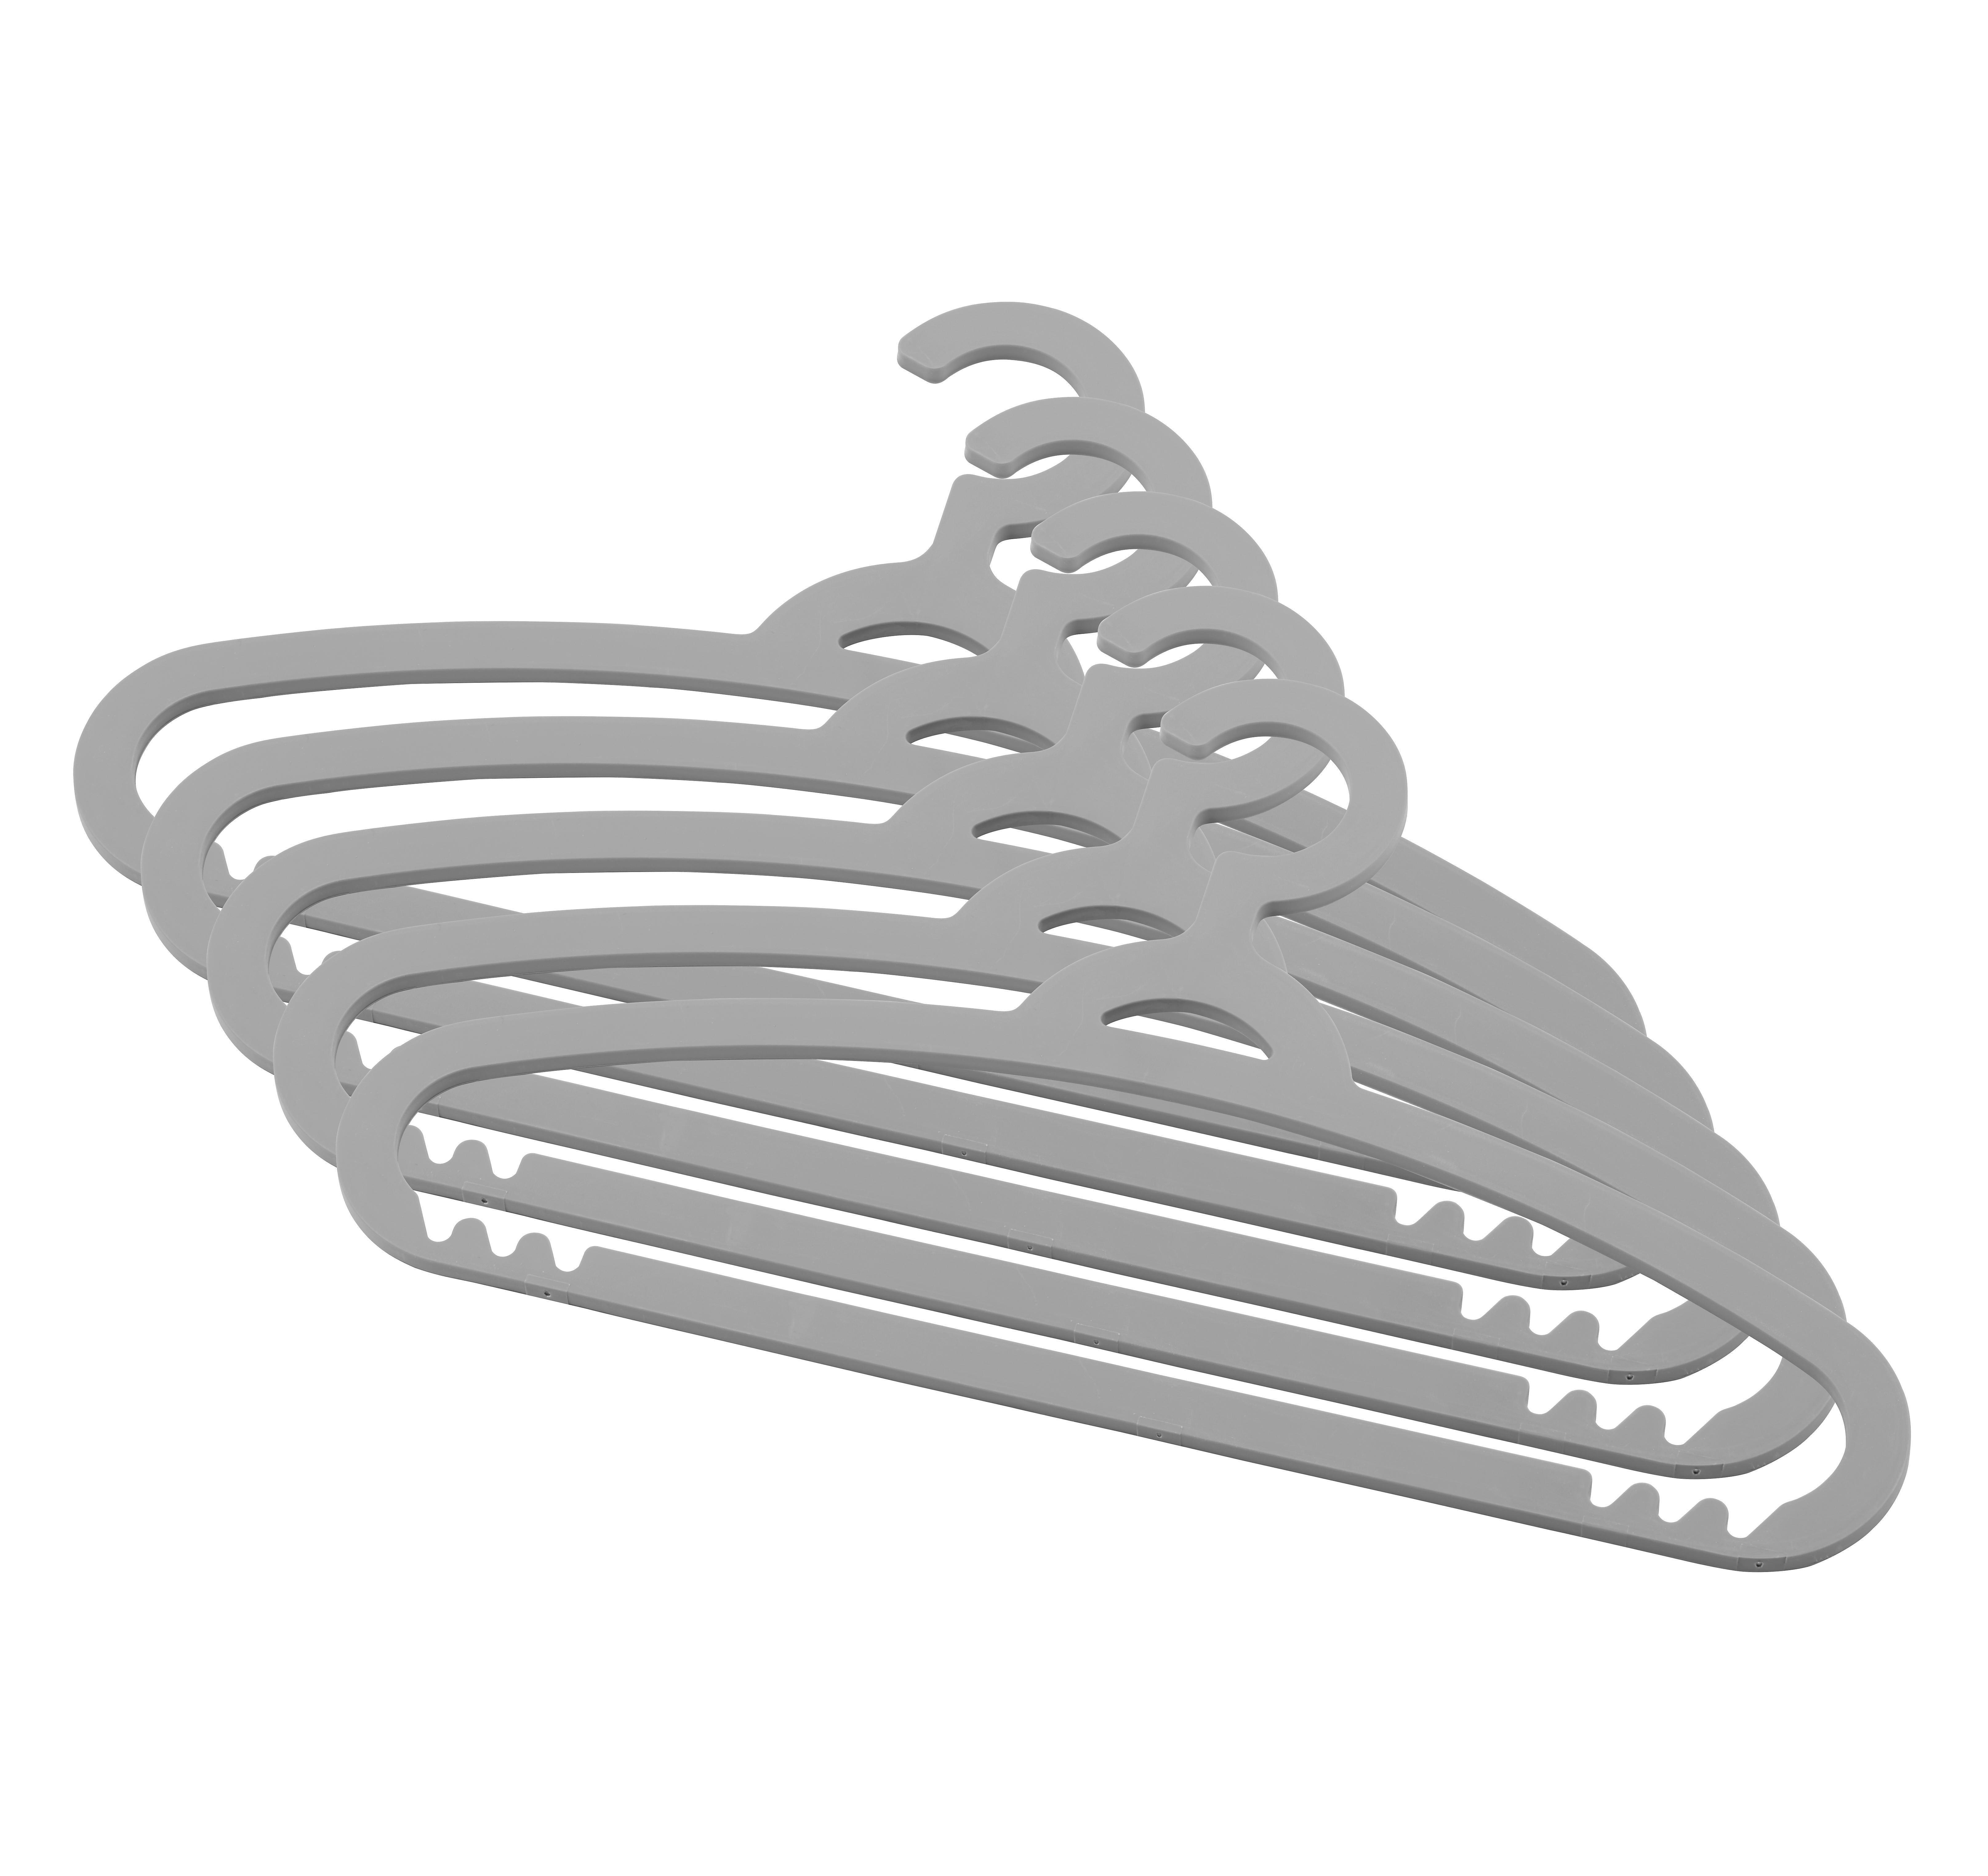 Kleiderbügelset Makie in Grau - Grau/Grün, Kunststoff (40/15,8/3,4cm) - MÖMAX modern living